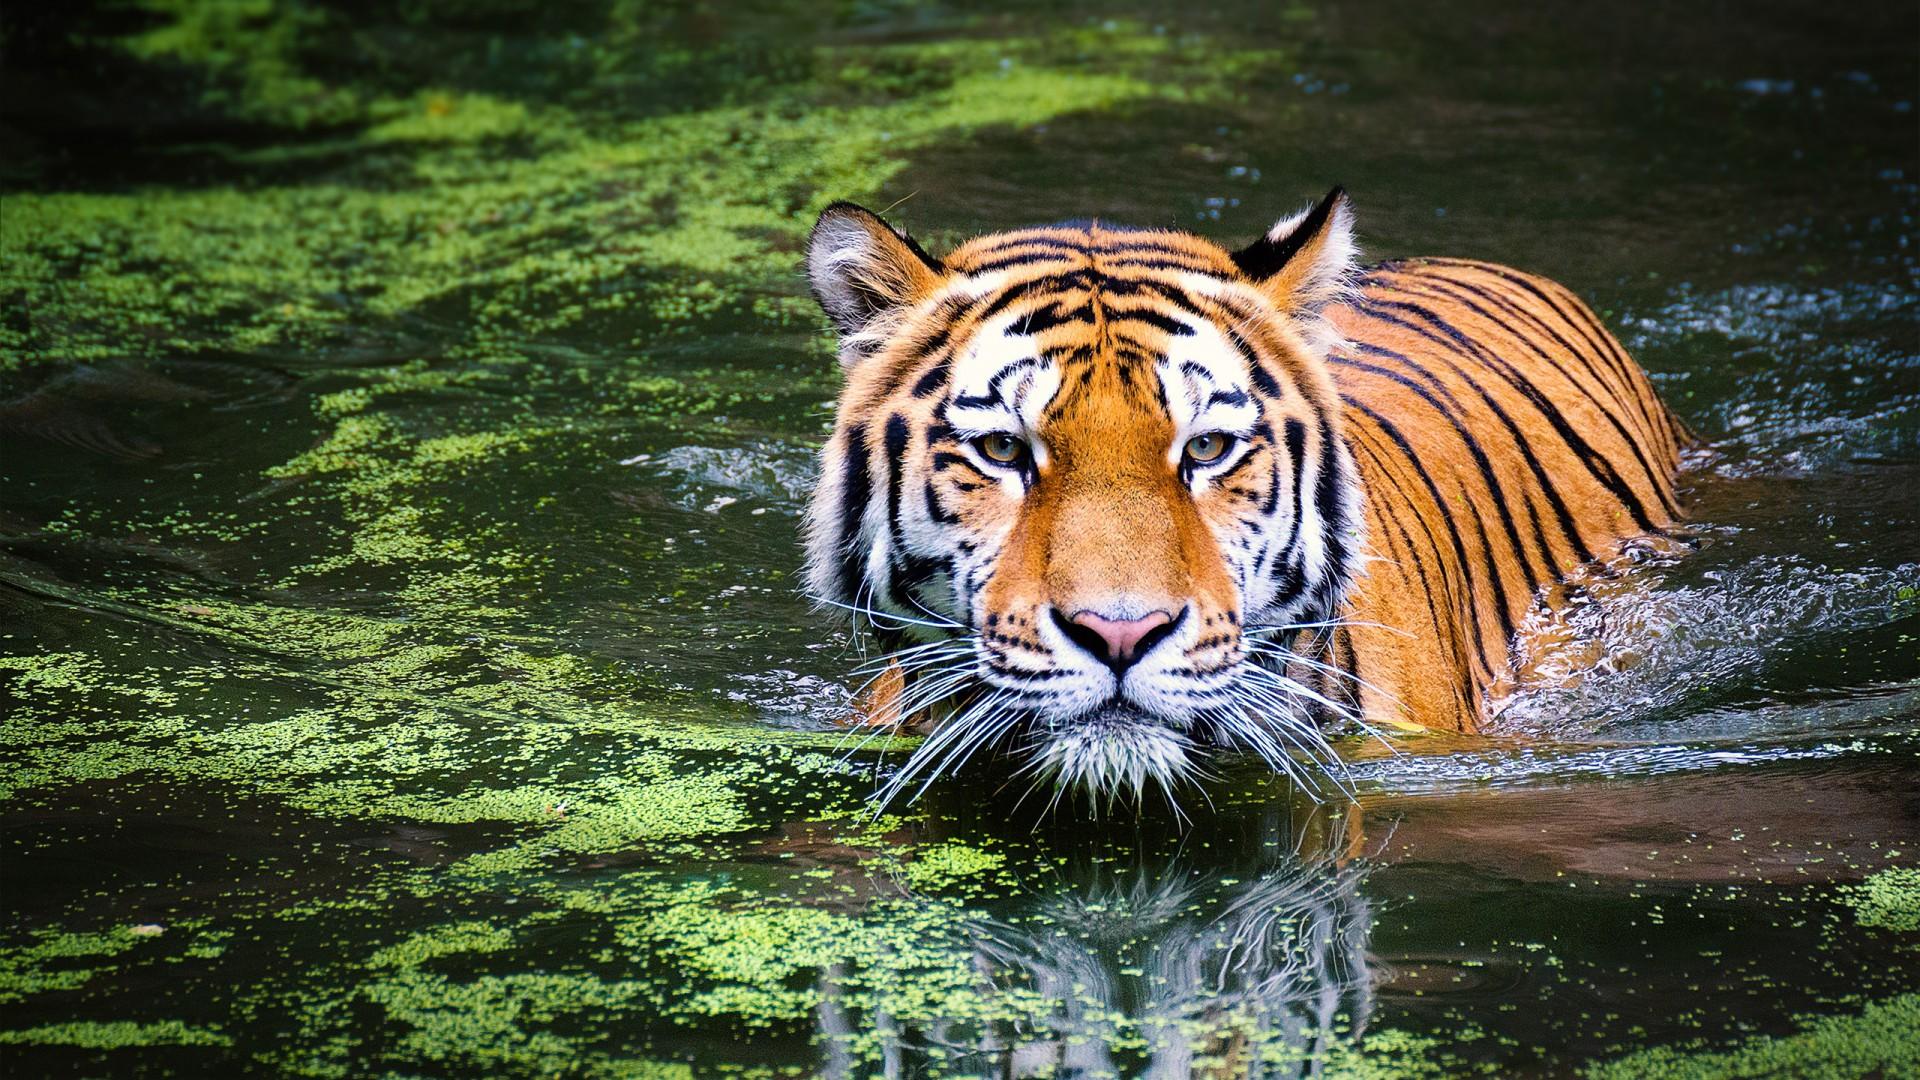 Cheetah 3d Wallpaper Tiger In Zoo Wallpapers Hd Wallpapers Id 21060